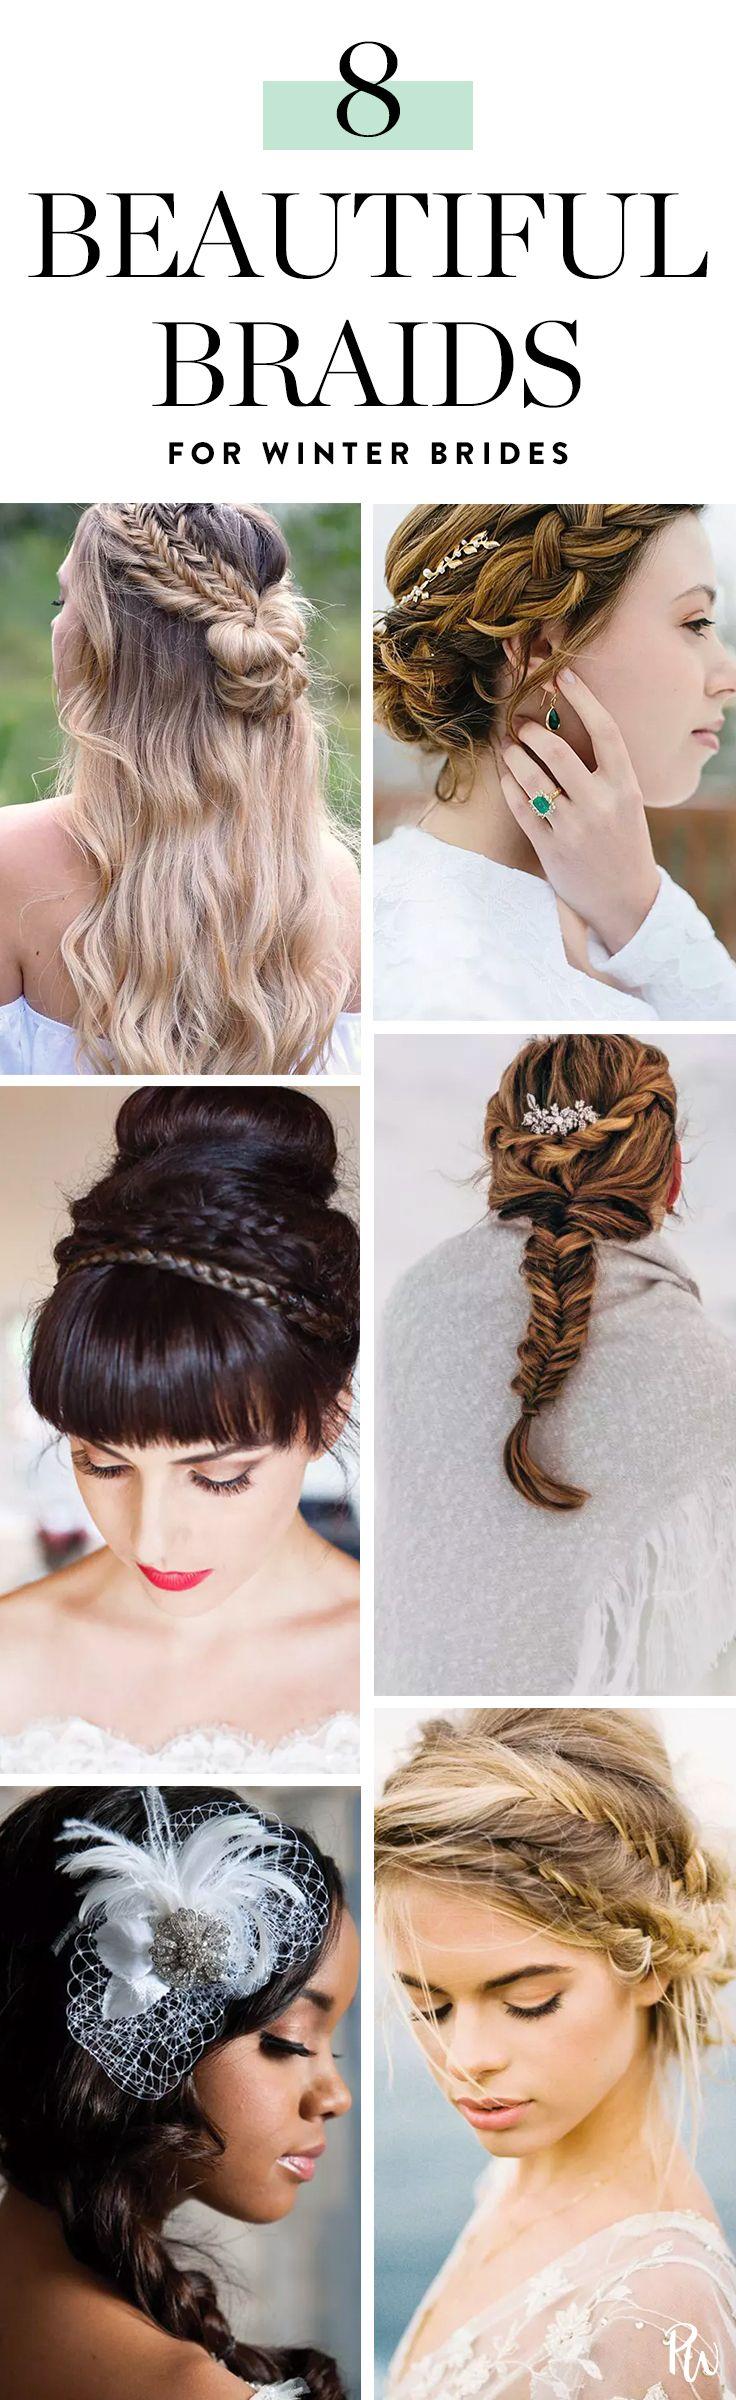 braid ideas for winter brides beauty pinterest braid